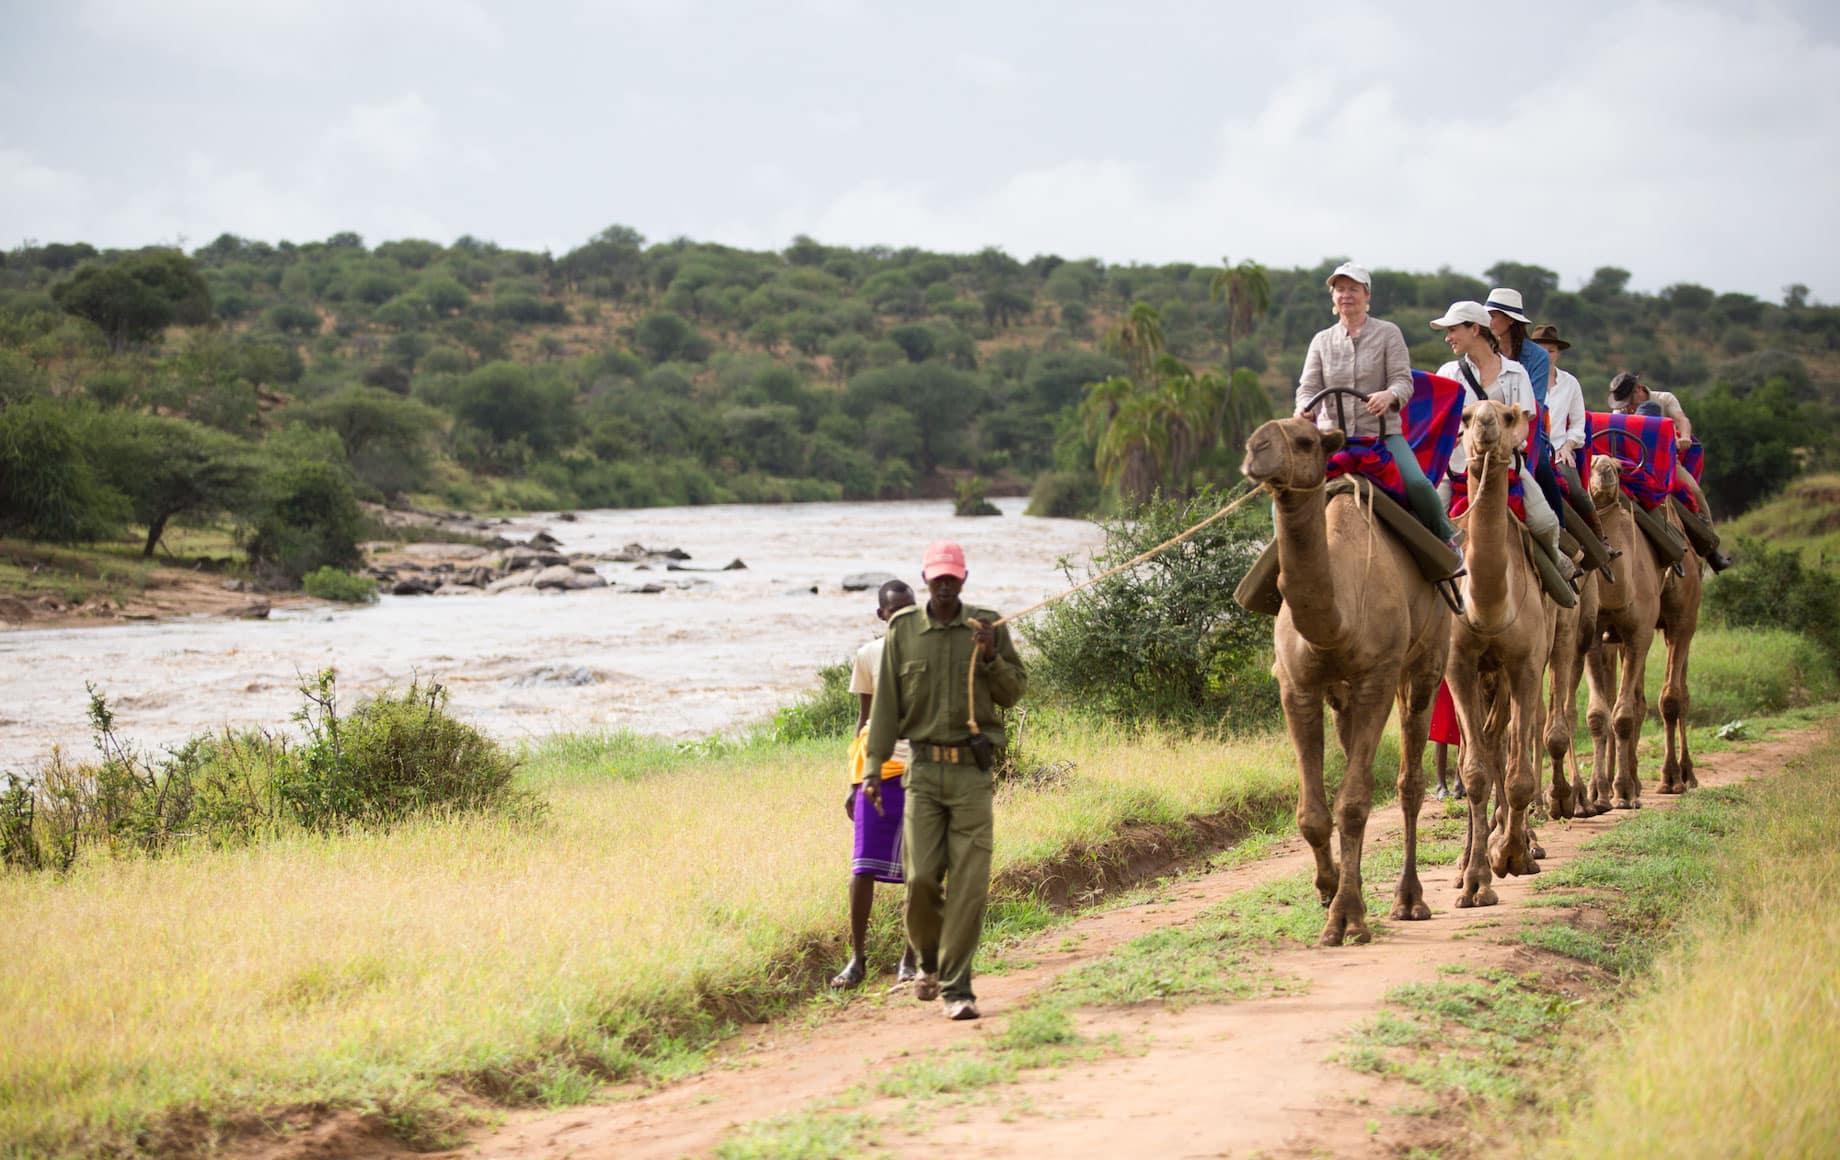 Guide leads horseback tour at Loisaba Conservancy